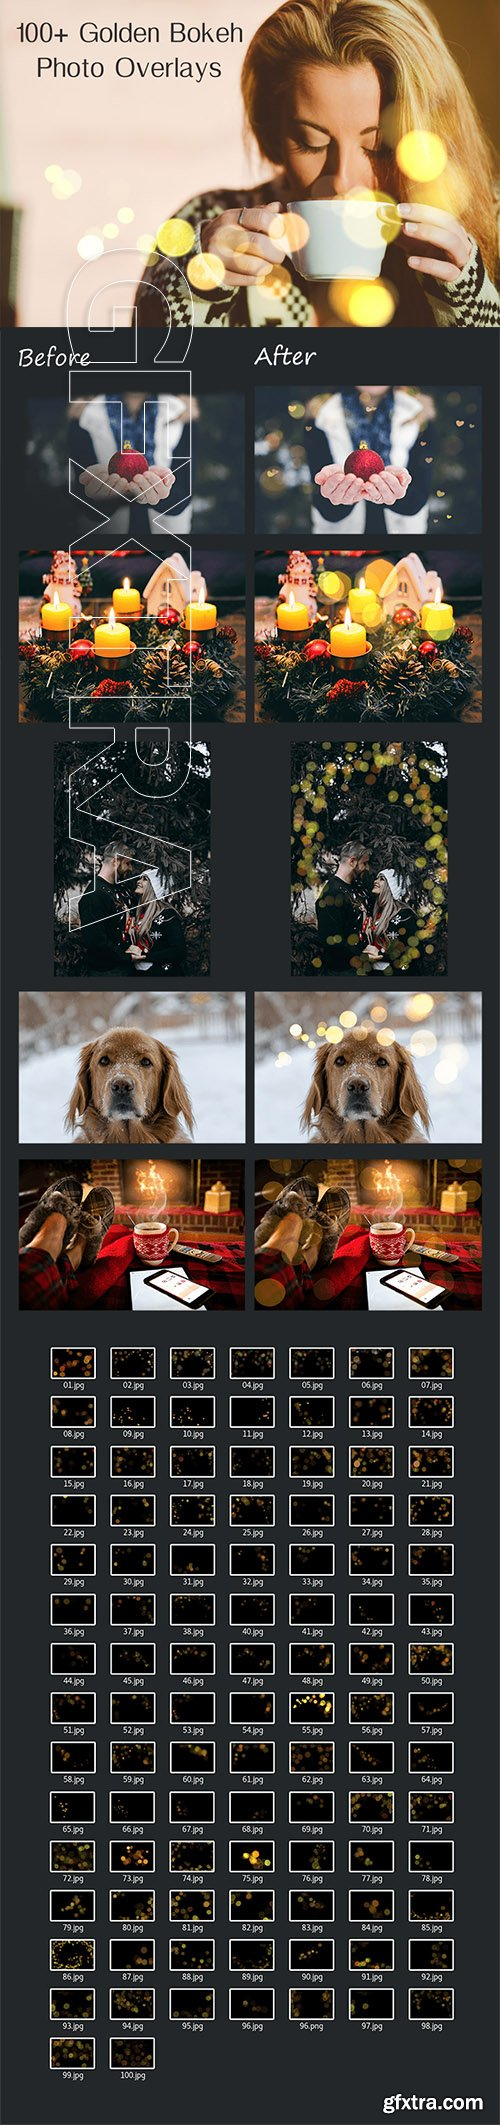 100 Golden Bokeh Photo Overlays